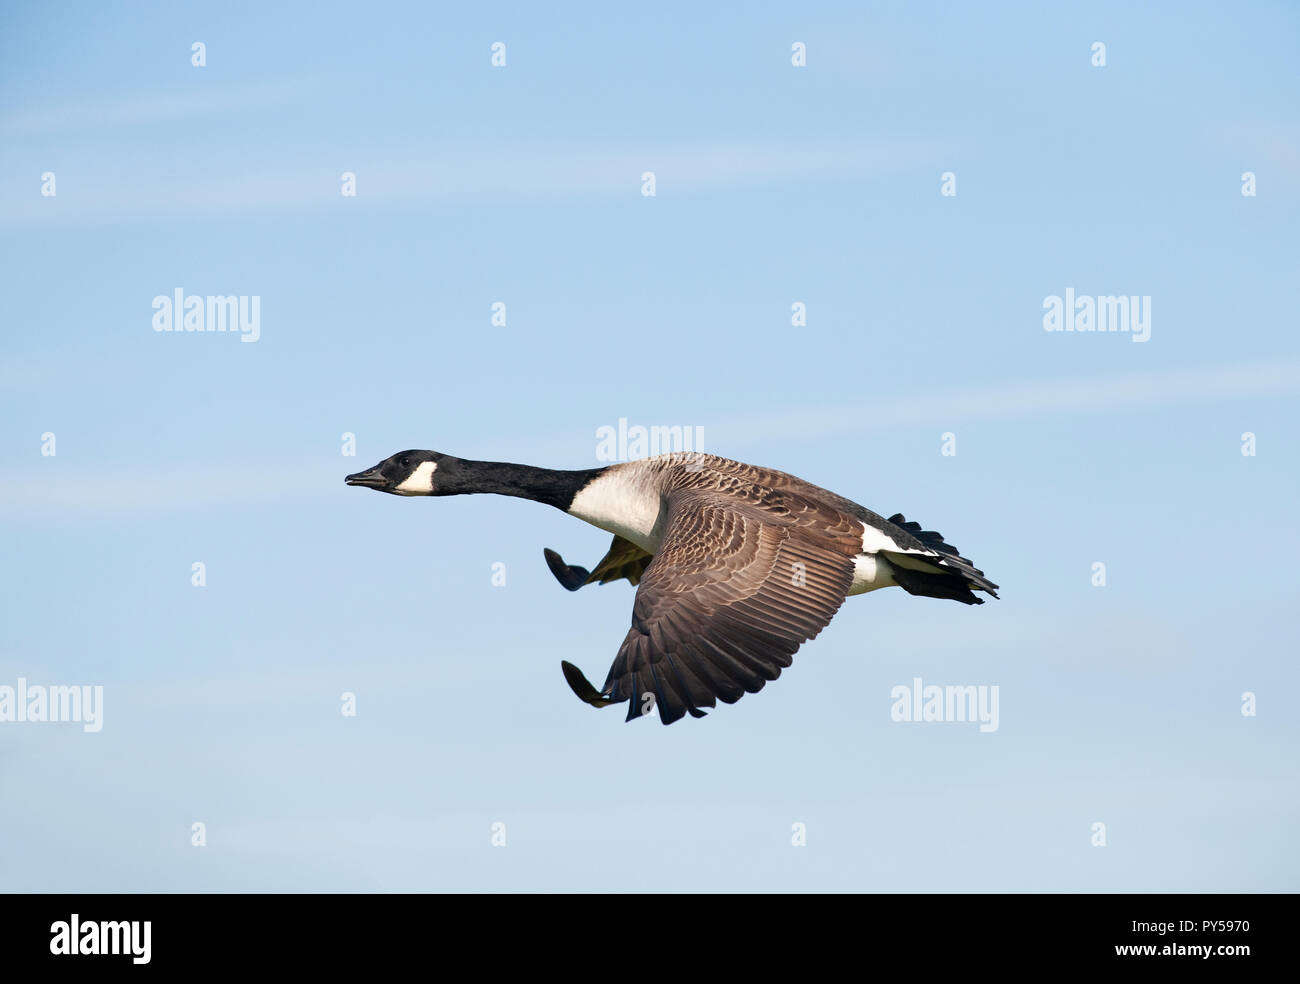 Canada Goose, Branta canadensis, flying over Brent Reservoir, Brent, London, United Kingdom - Stock Image